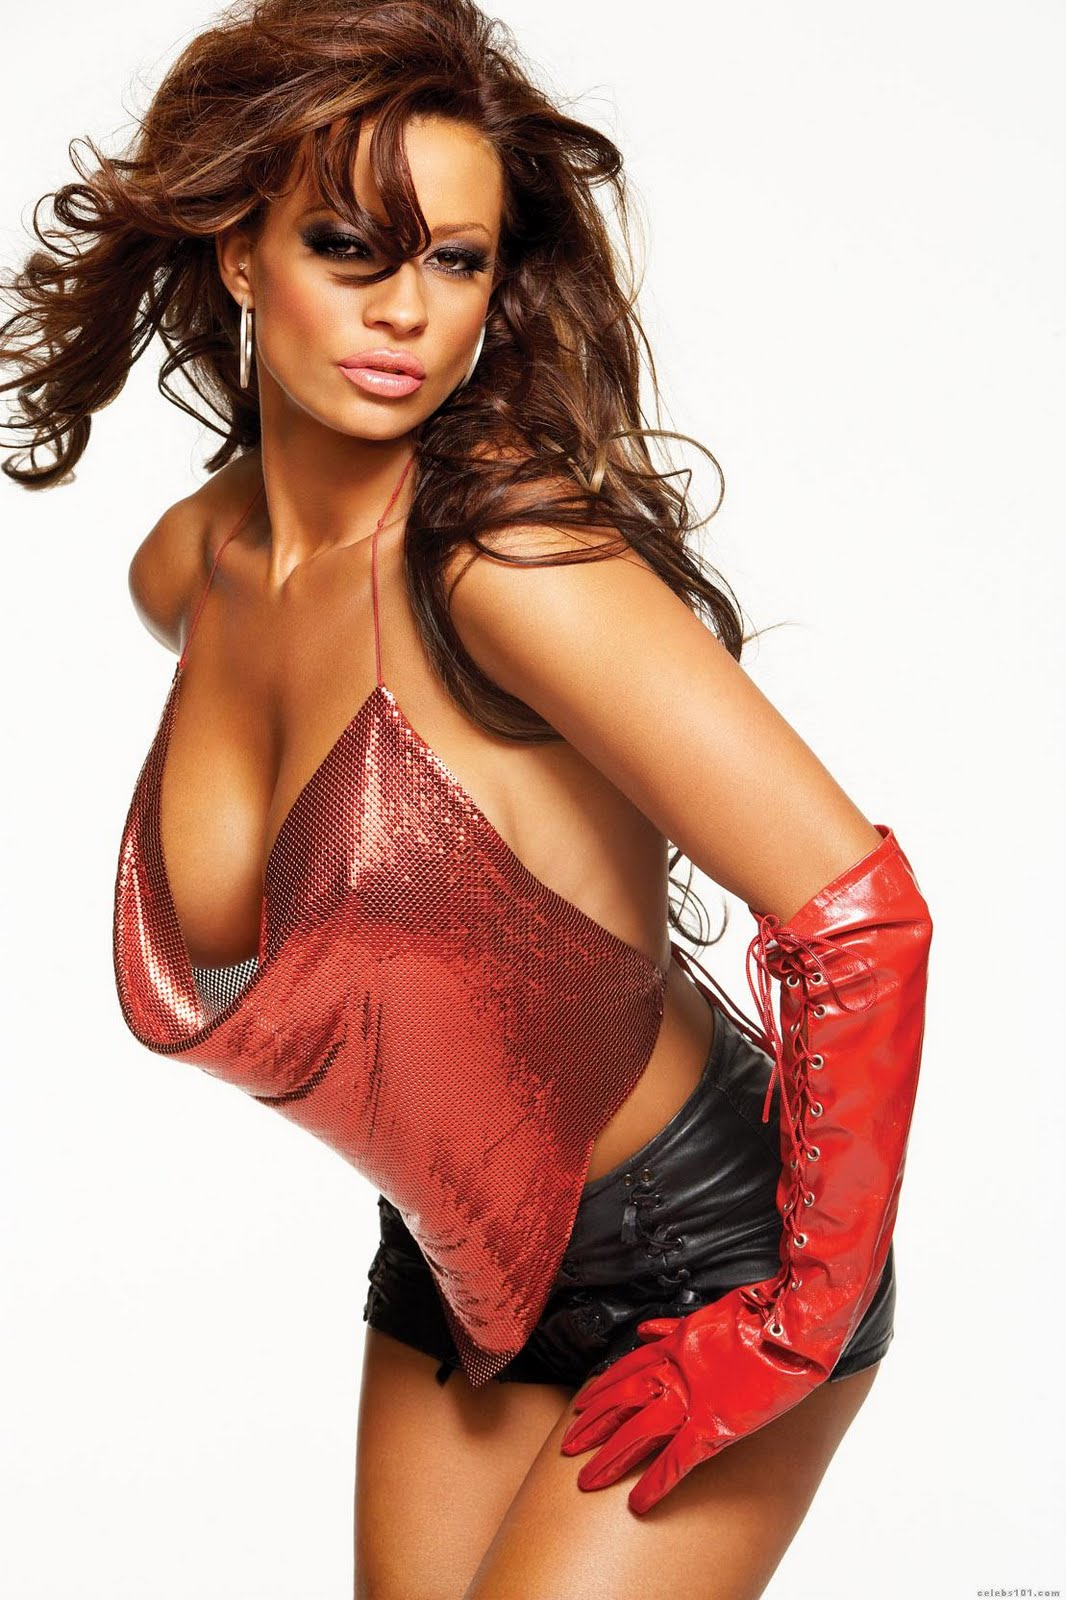 Girl Smoking Wallpaper Hd Babestrip Candice Michelle